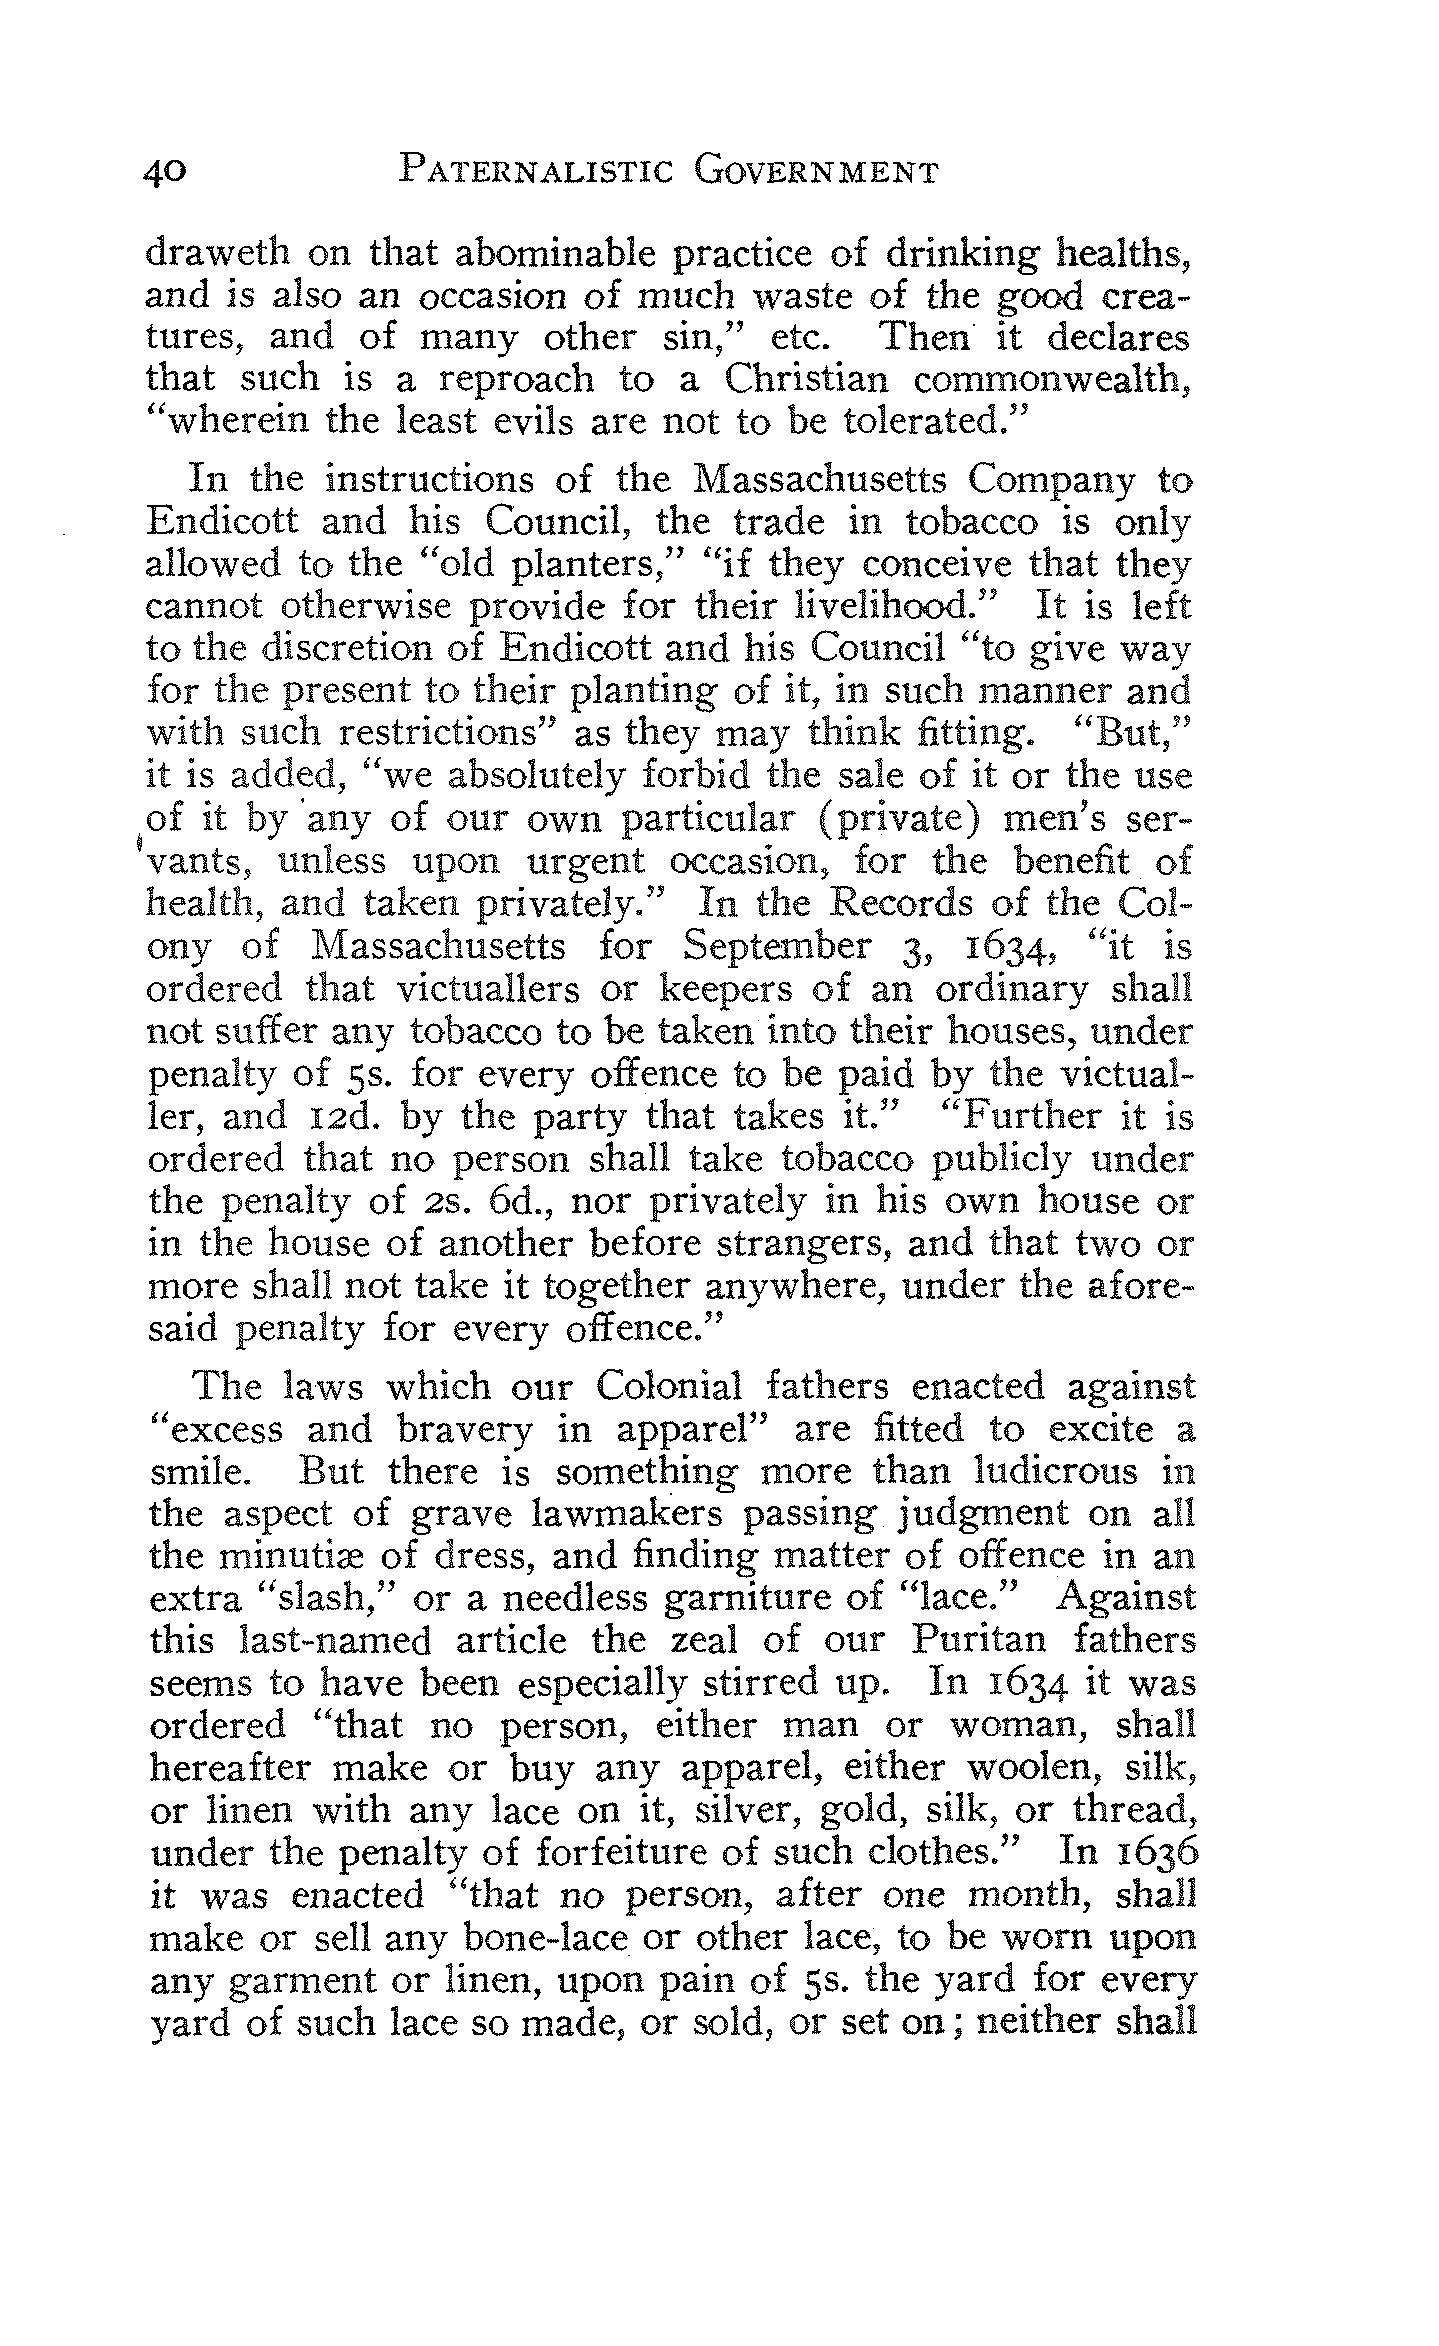 English critical essay help